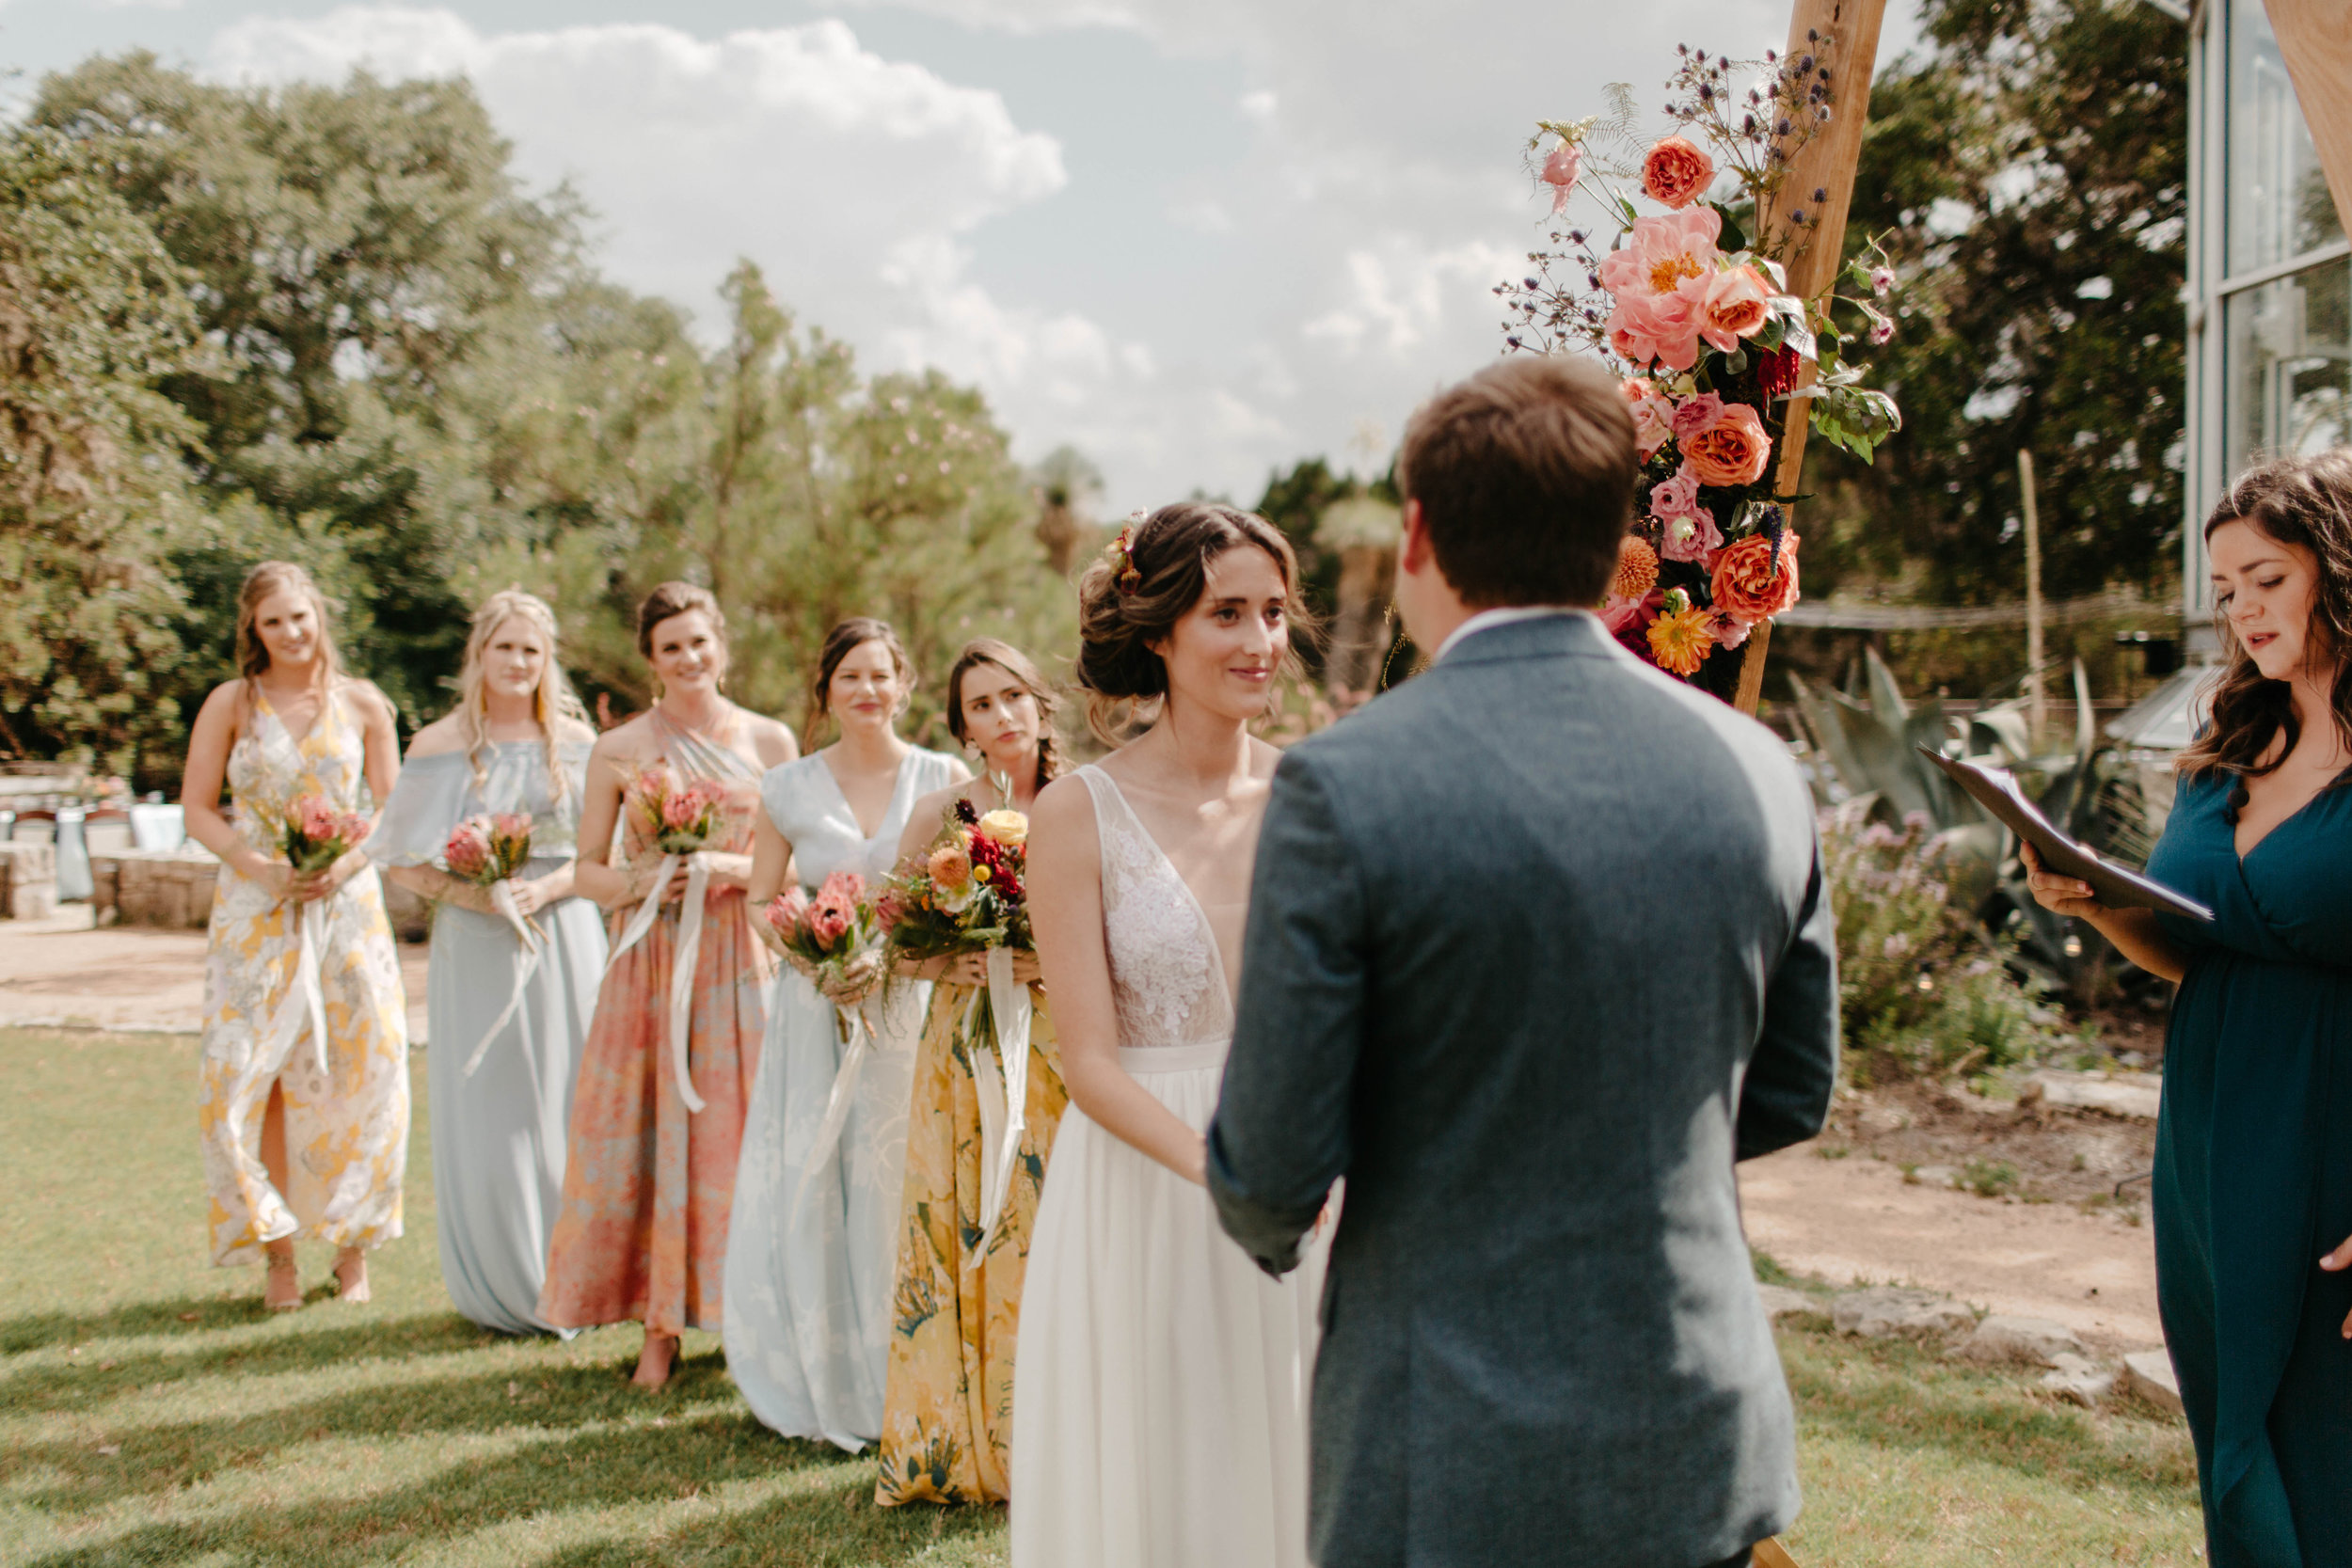 Oniel_Austin_Texas_Wedding_The_Teagues-179.jpg